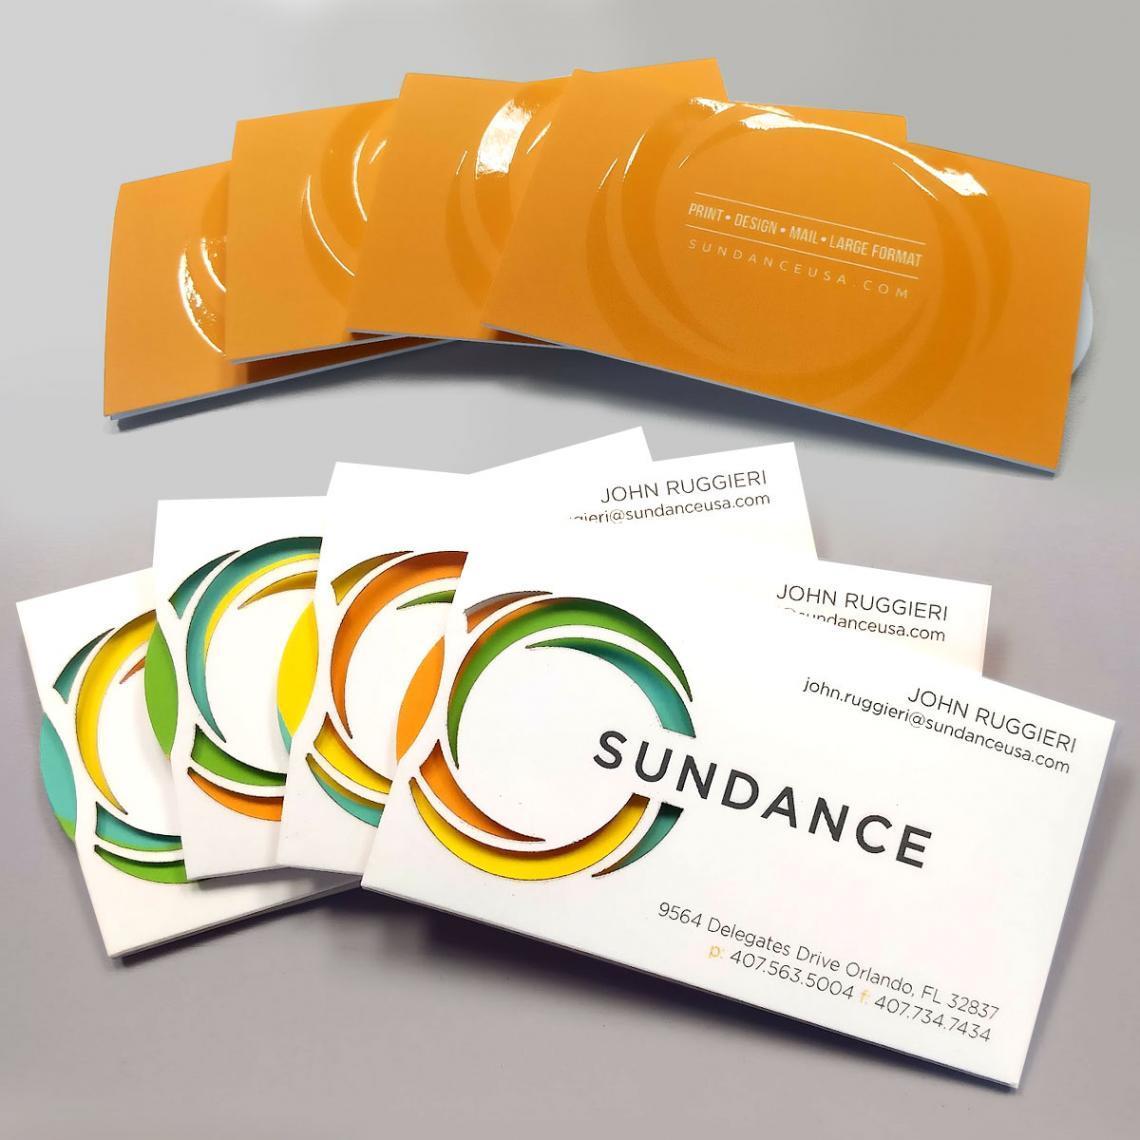 Video - SunDance's Spinning Business Card on 60 Second Fold